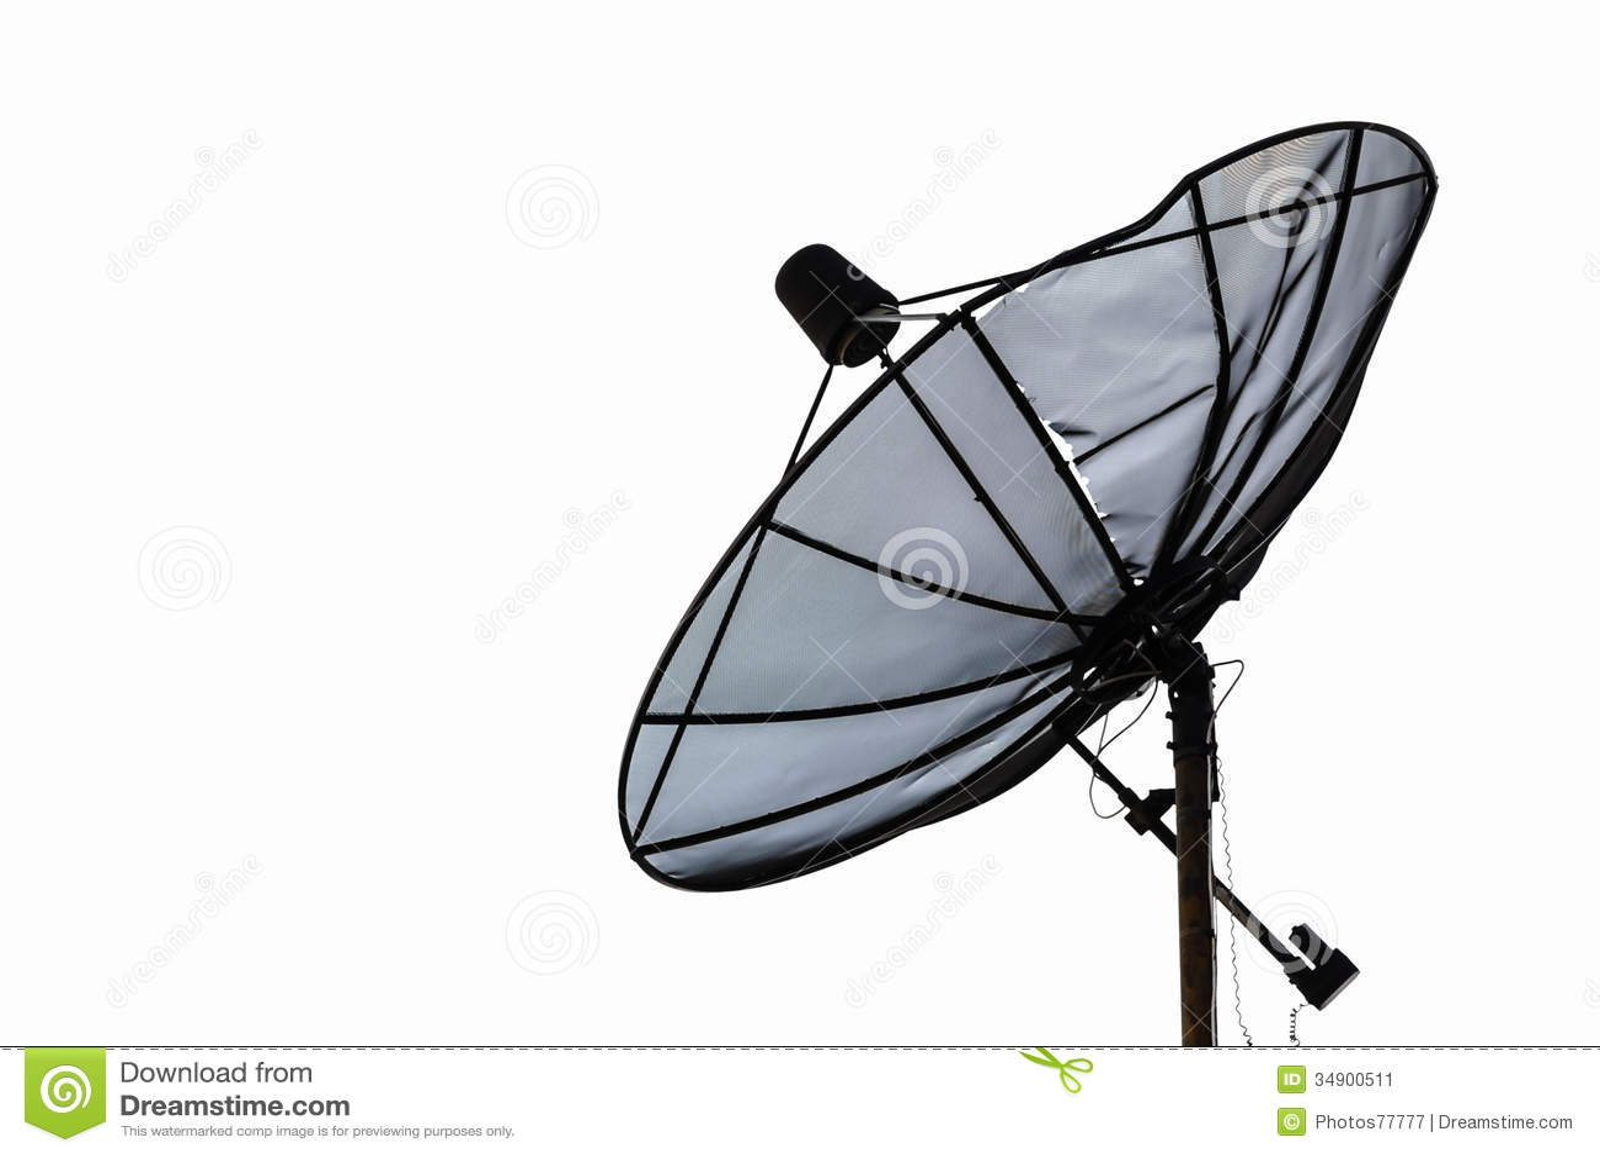 satellite dish dilapidated royalty free stock photography image